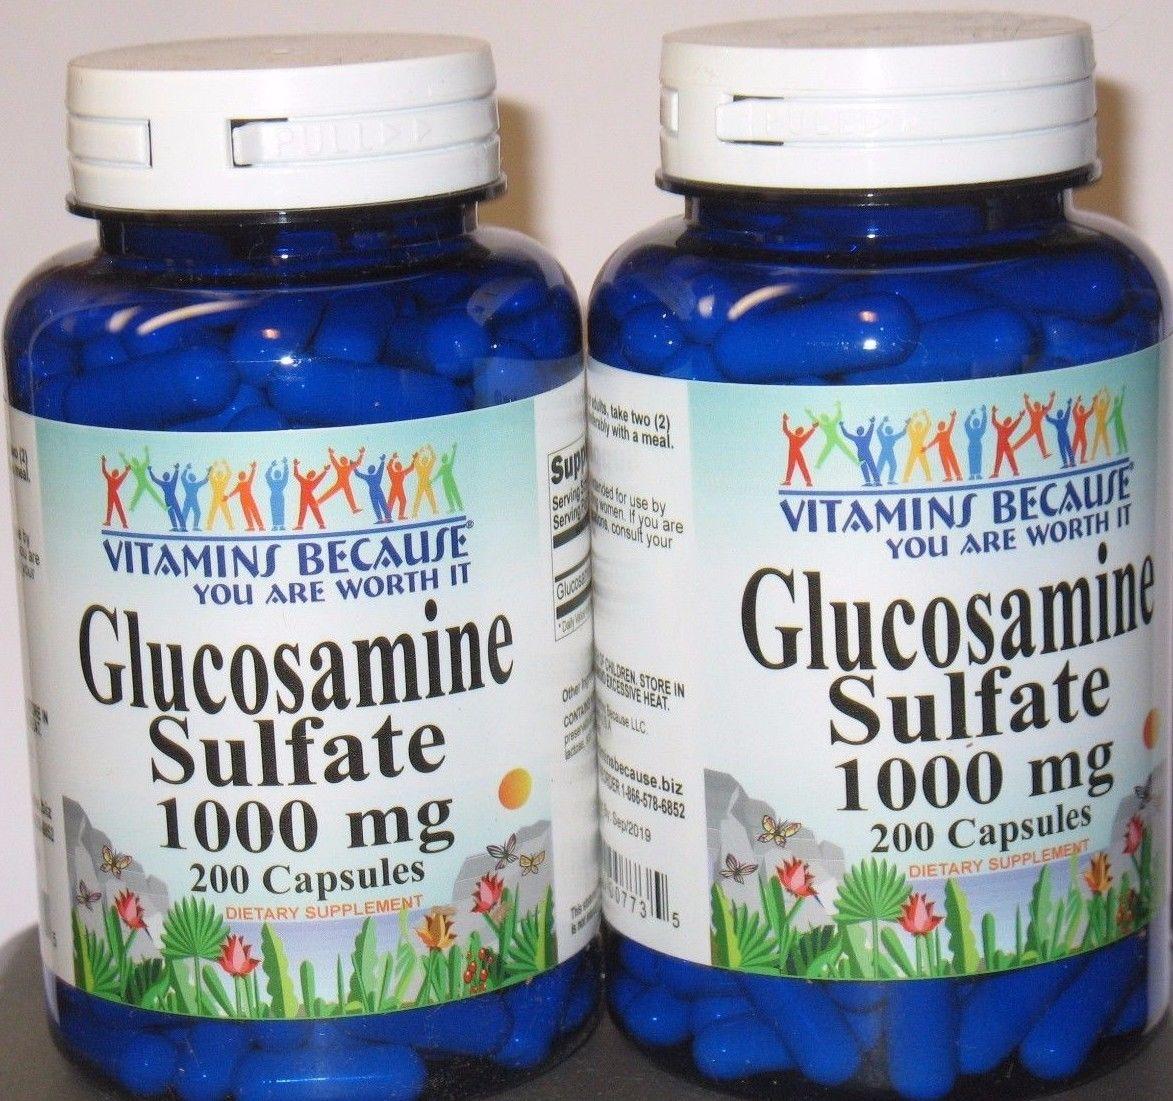 2 x Glucosamine Sulfate 1000 mg  400 Capsules Joint Health